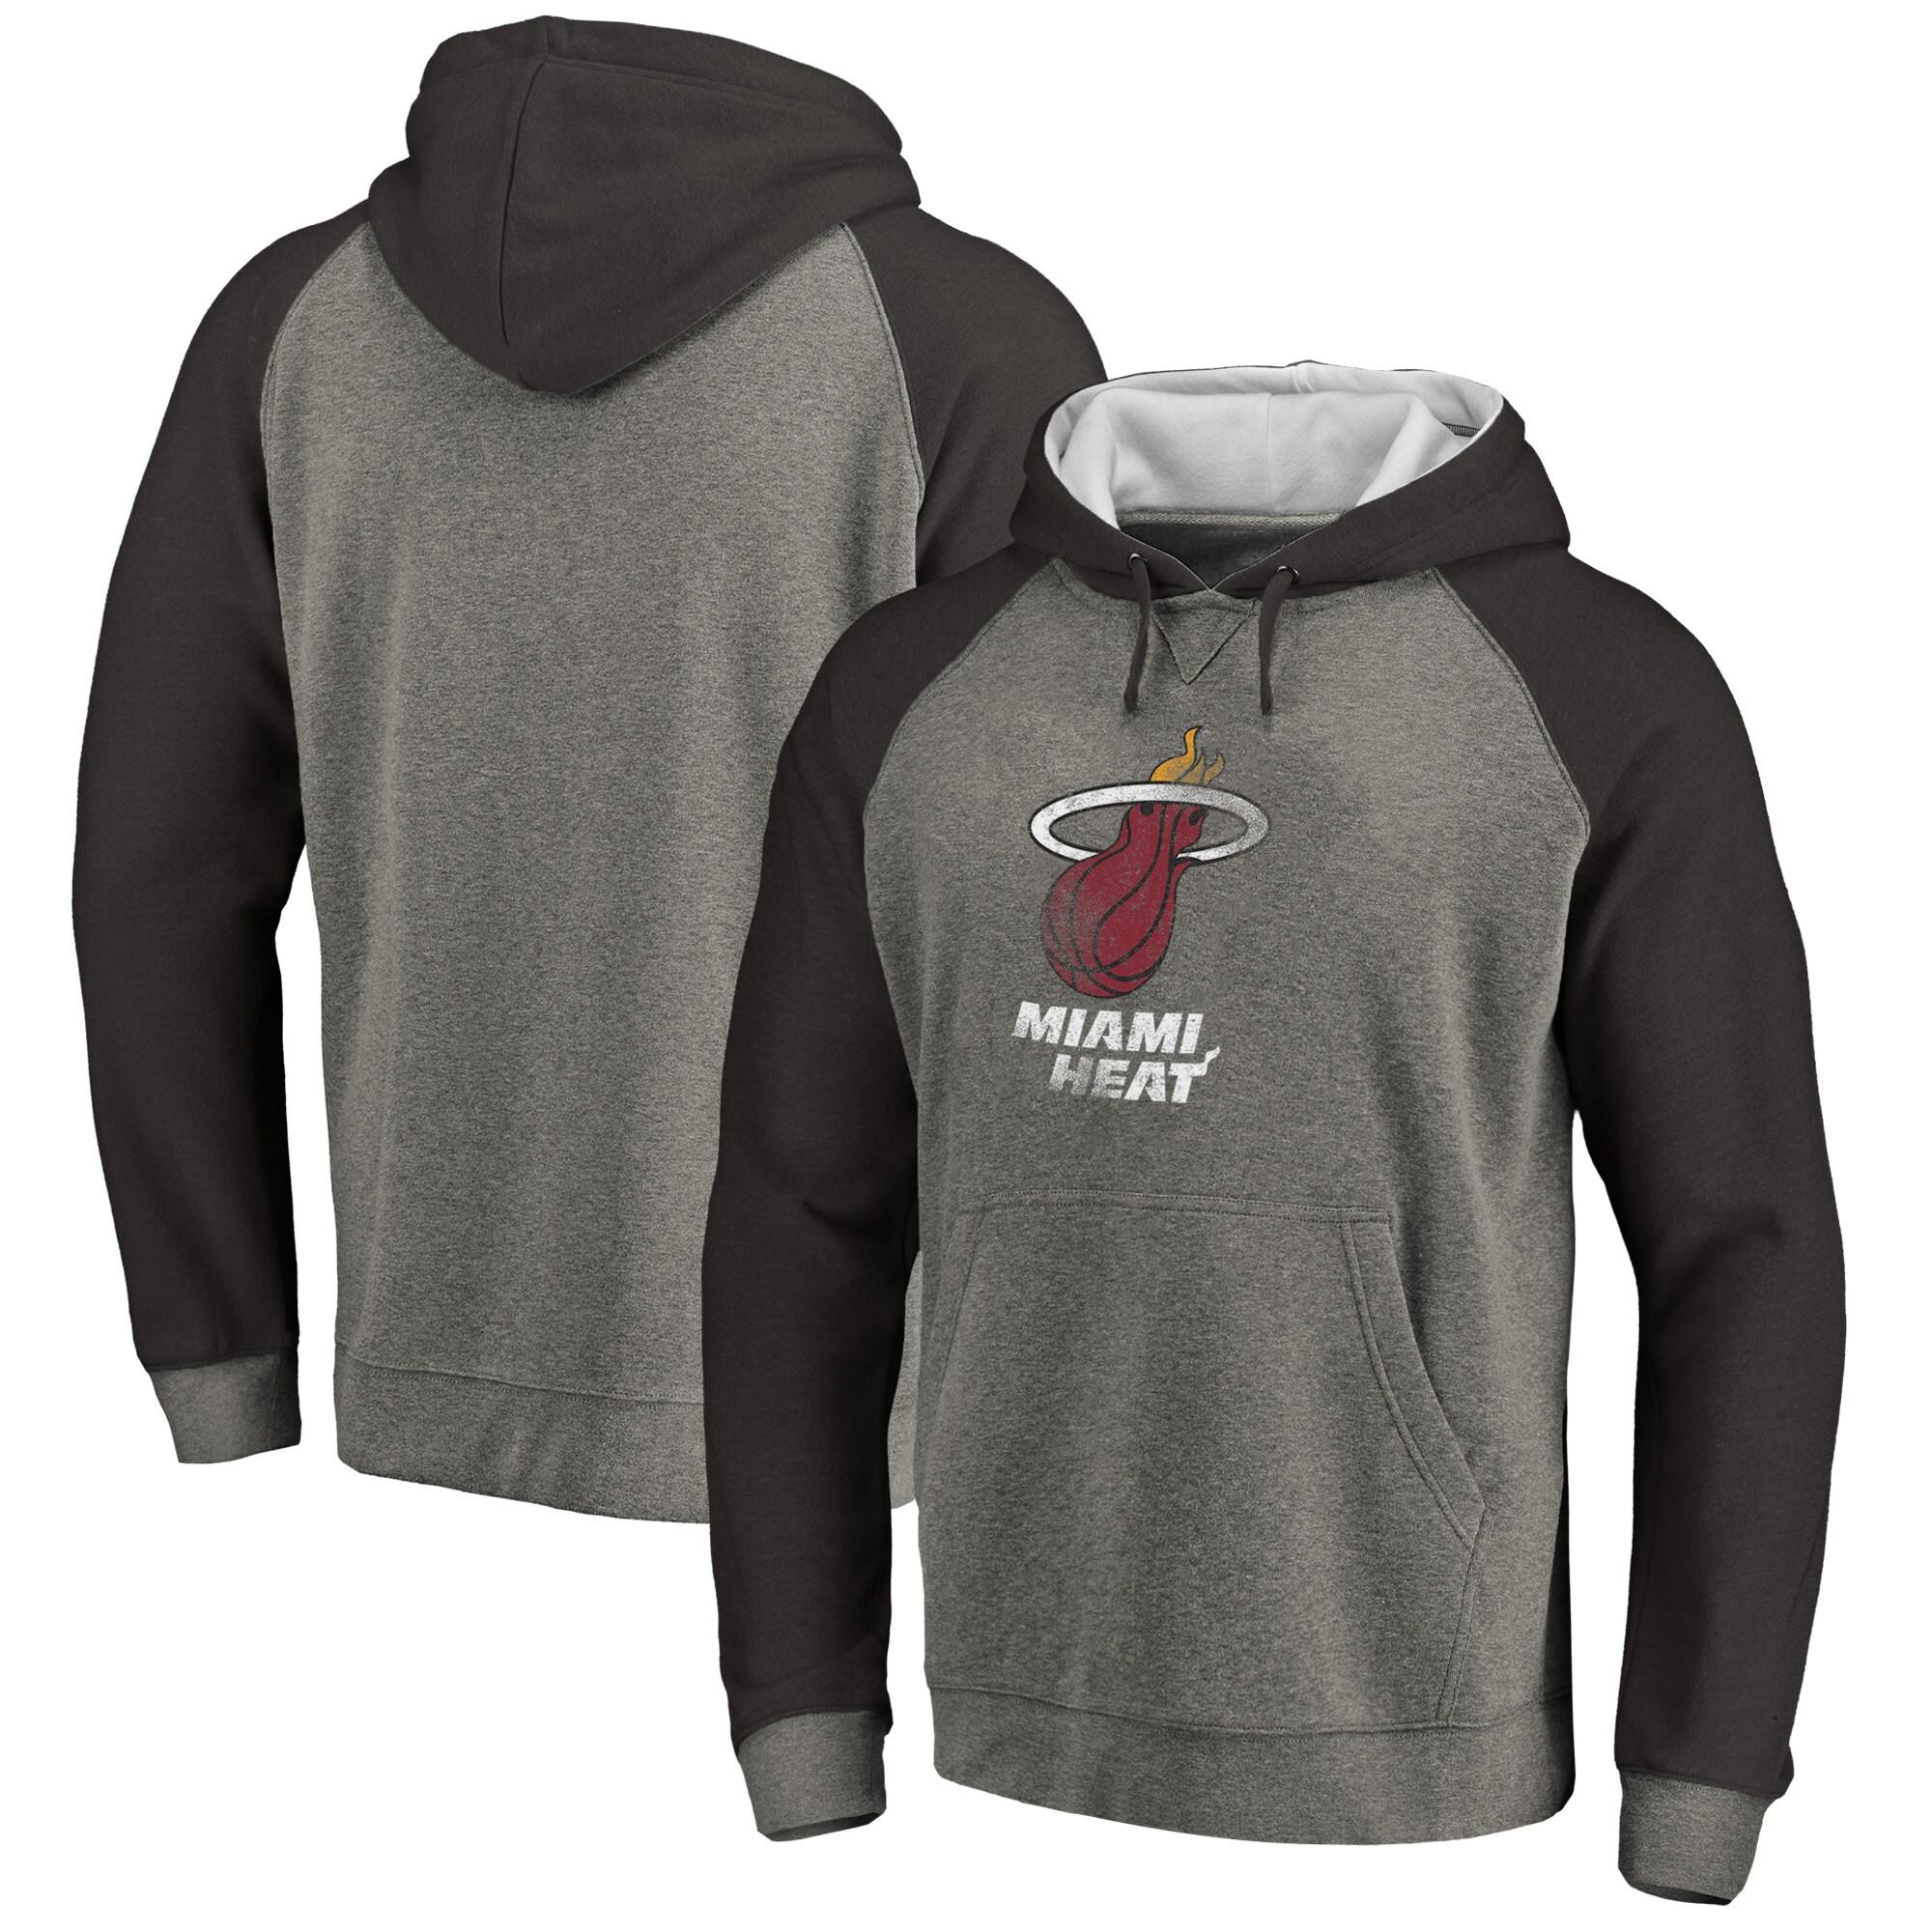 Miami Heat Fanatics Branded Distressed Logo Tri-Blend Pullover Hoodie - Ash/Black